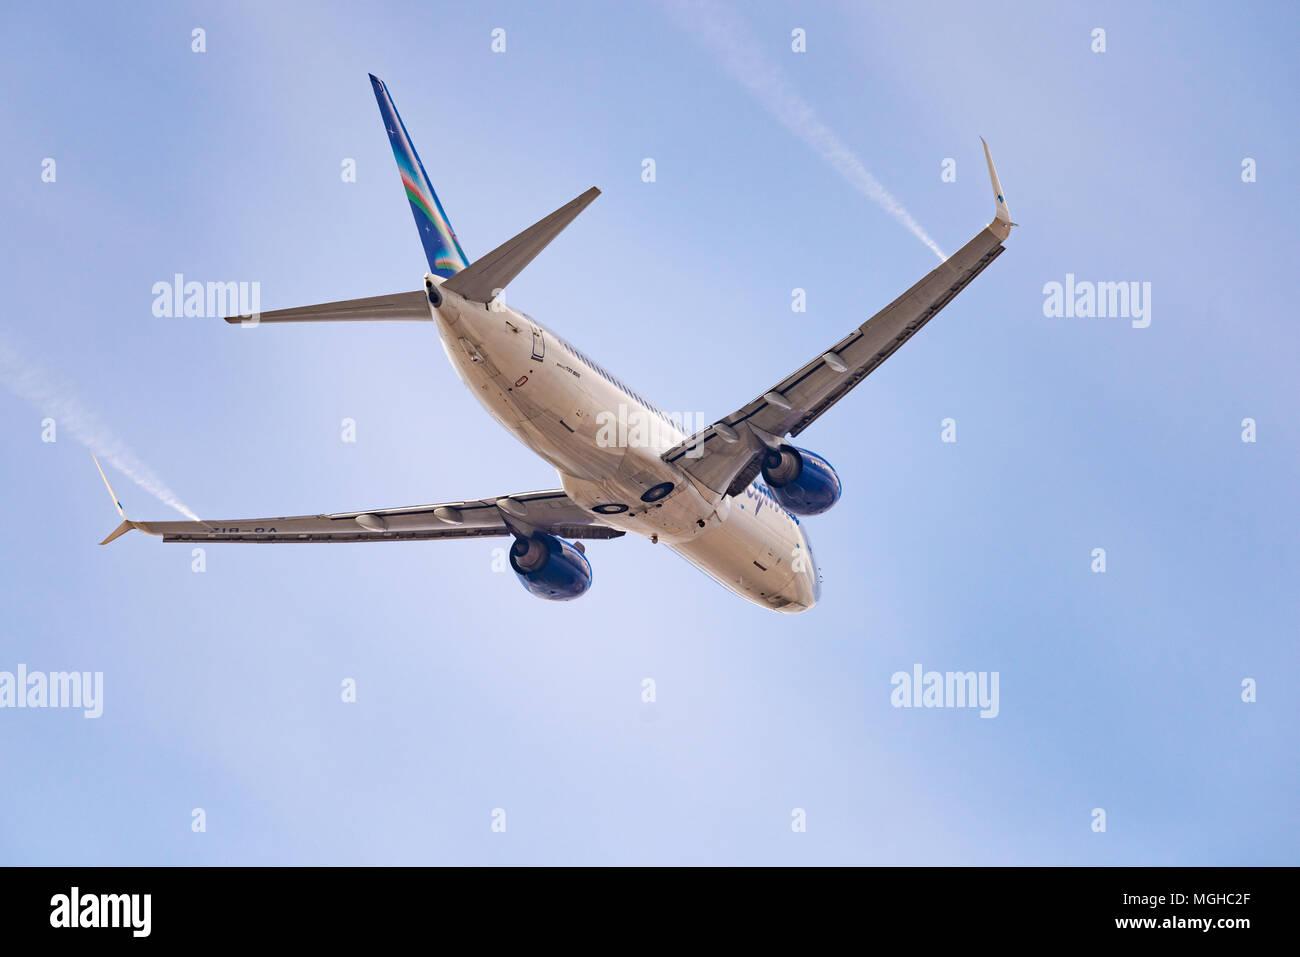 Novosibirsk, Russia - April 27, 2018: Boeing 737-86N VQ-BIZ Yakutia Airlines  after takeoff from Tolmachevo International Airport. Stock Photo